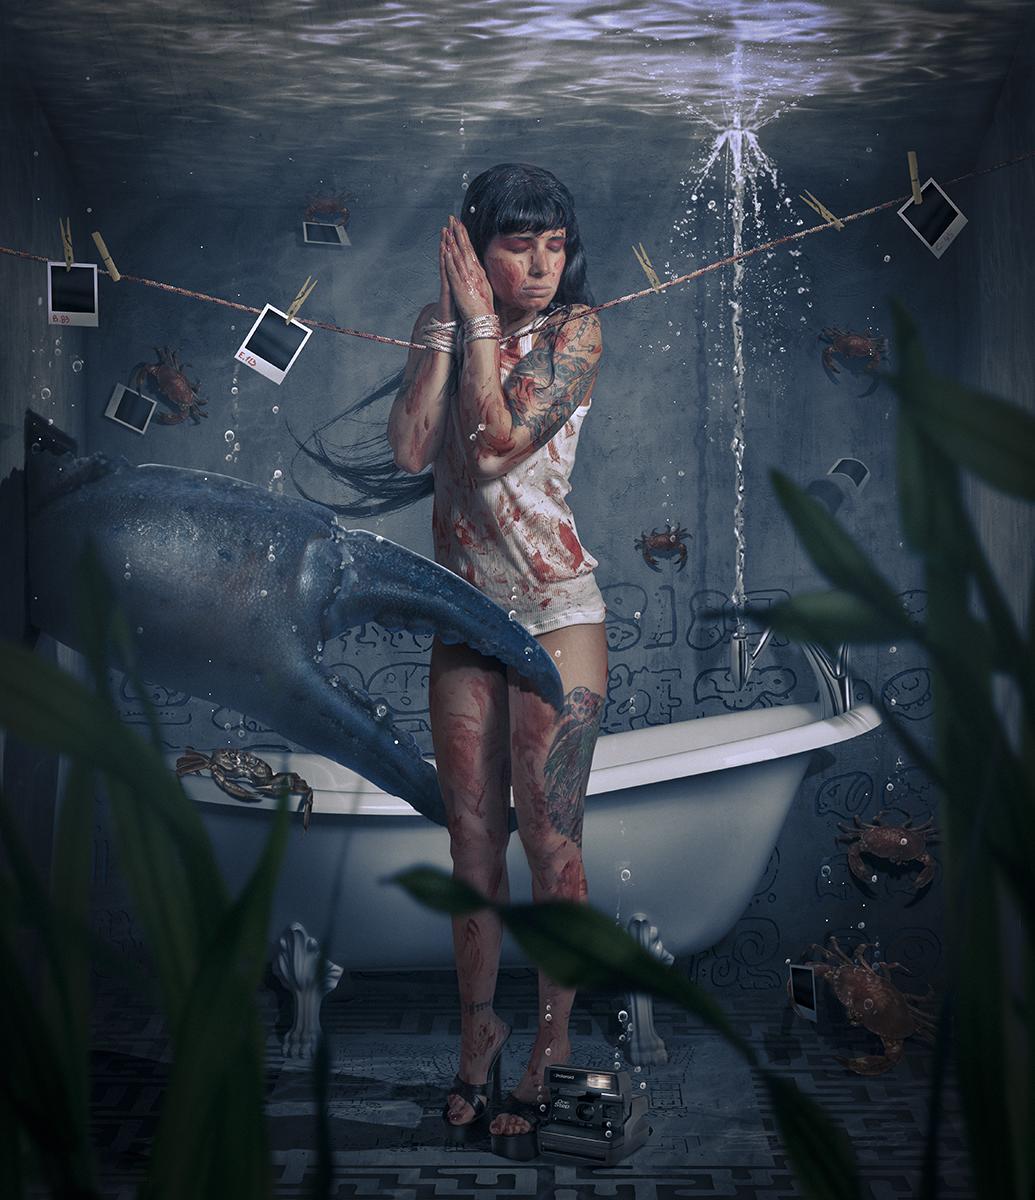 RamiDiablo Kerpelman - Malchiella Page - makeup Elena Fishkin